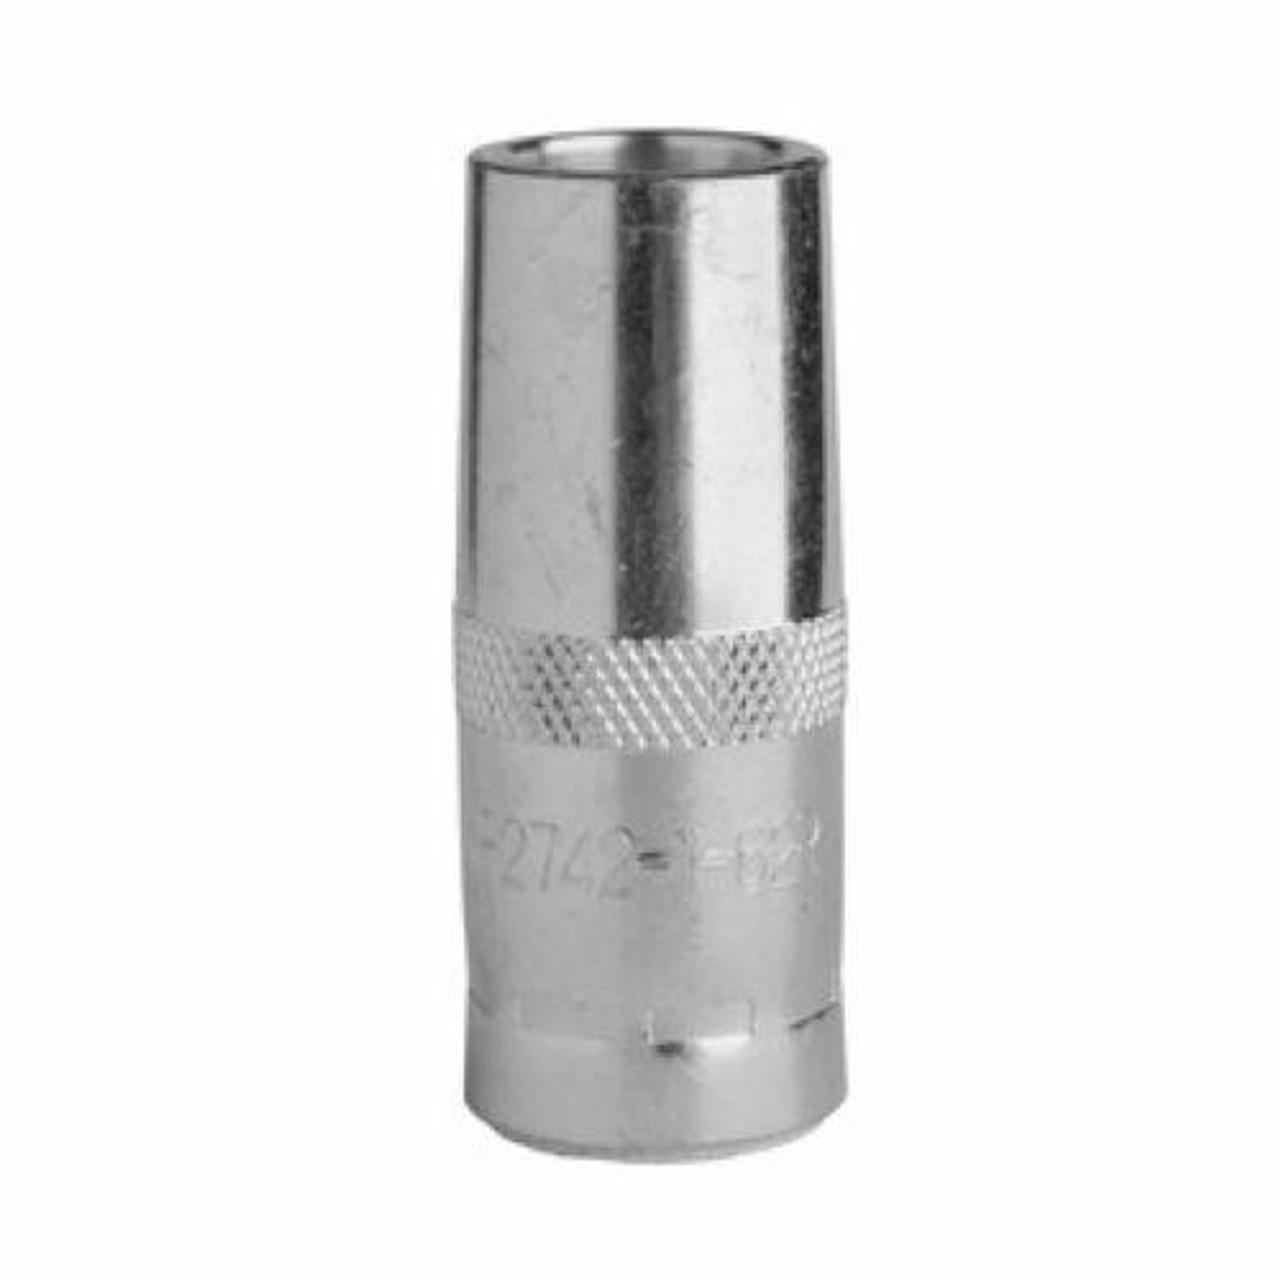 Lincoln 350A Thread-on Nozzle Flush 1/2 Inner Diameter KP2742-1-50F